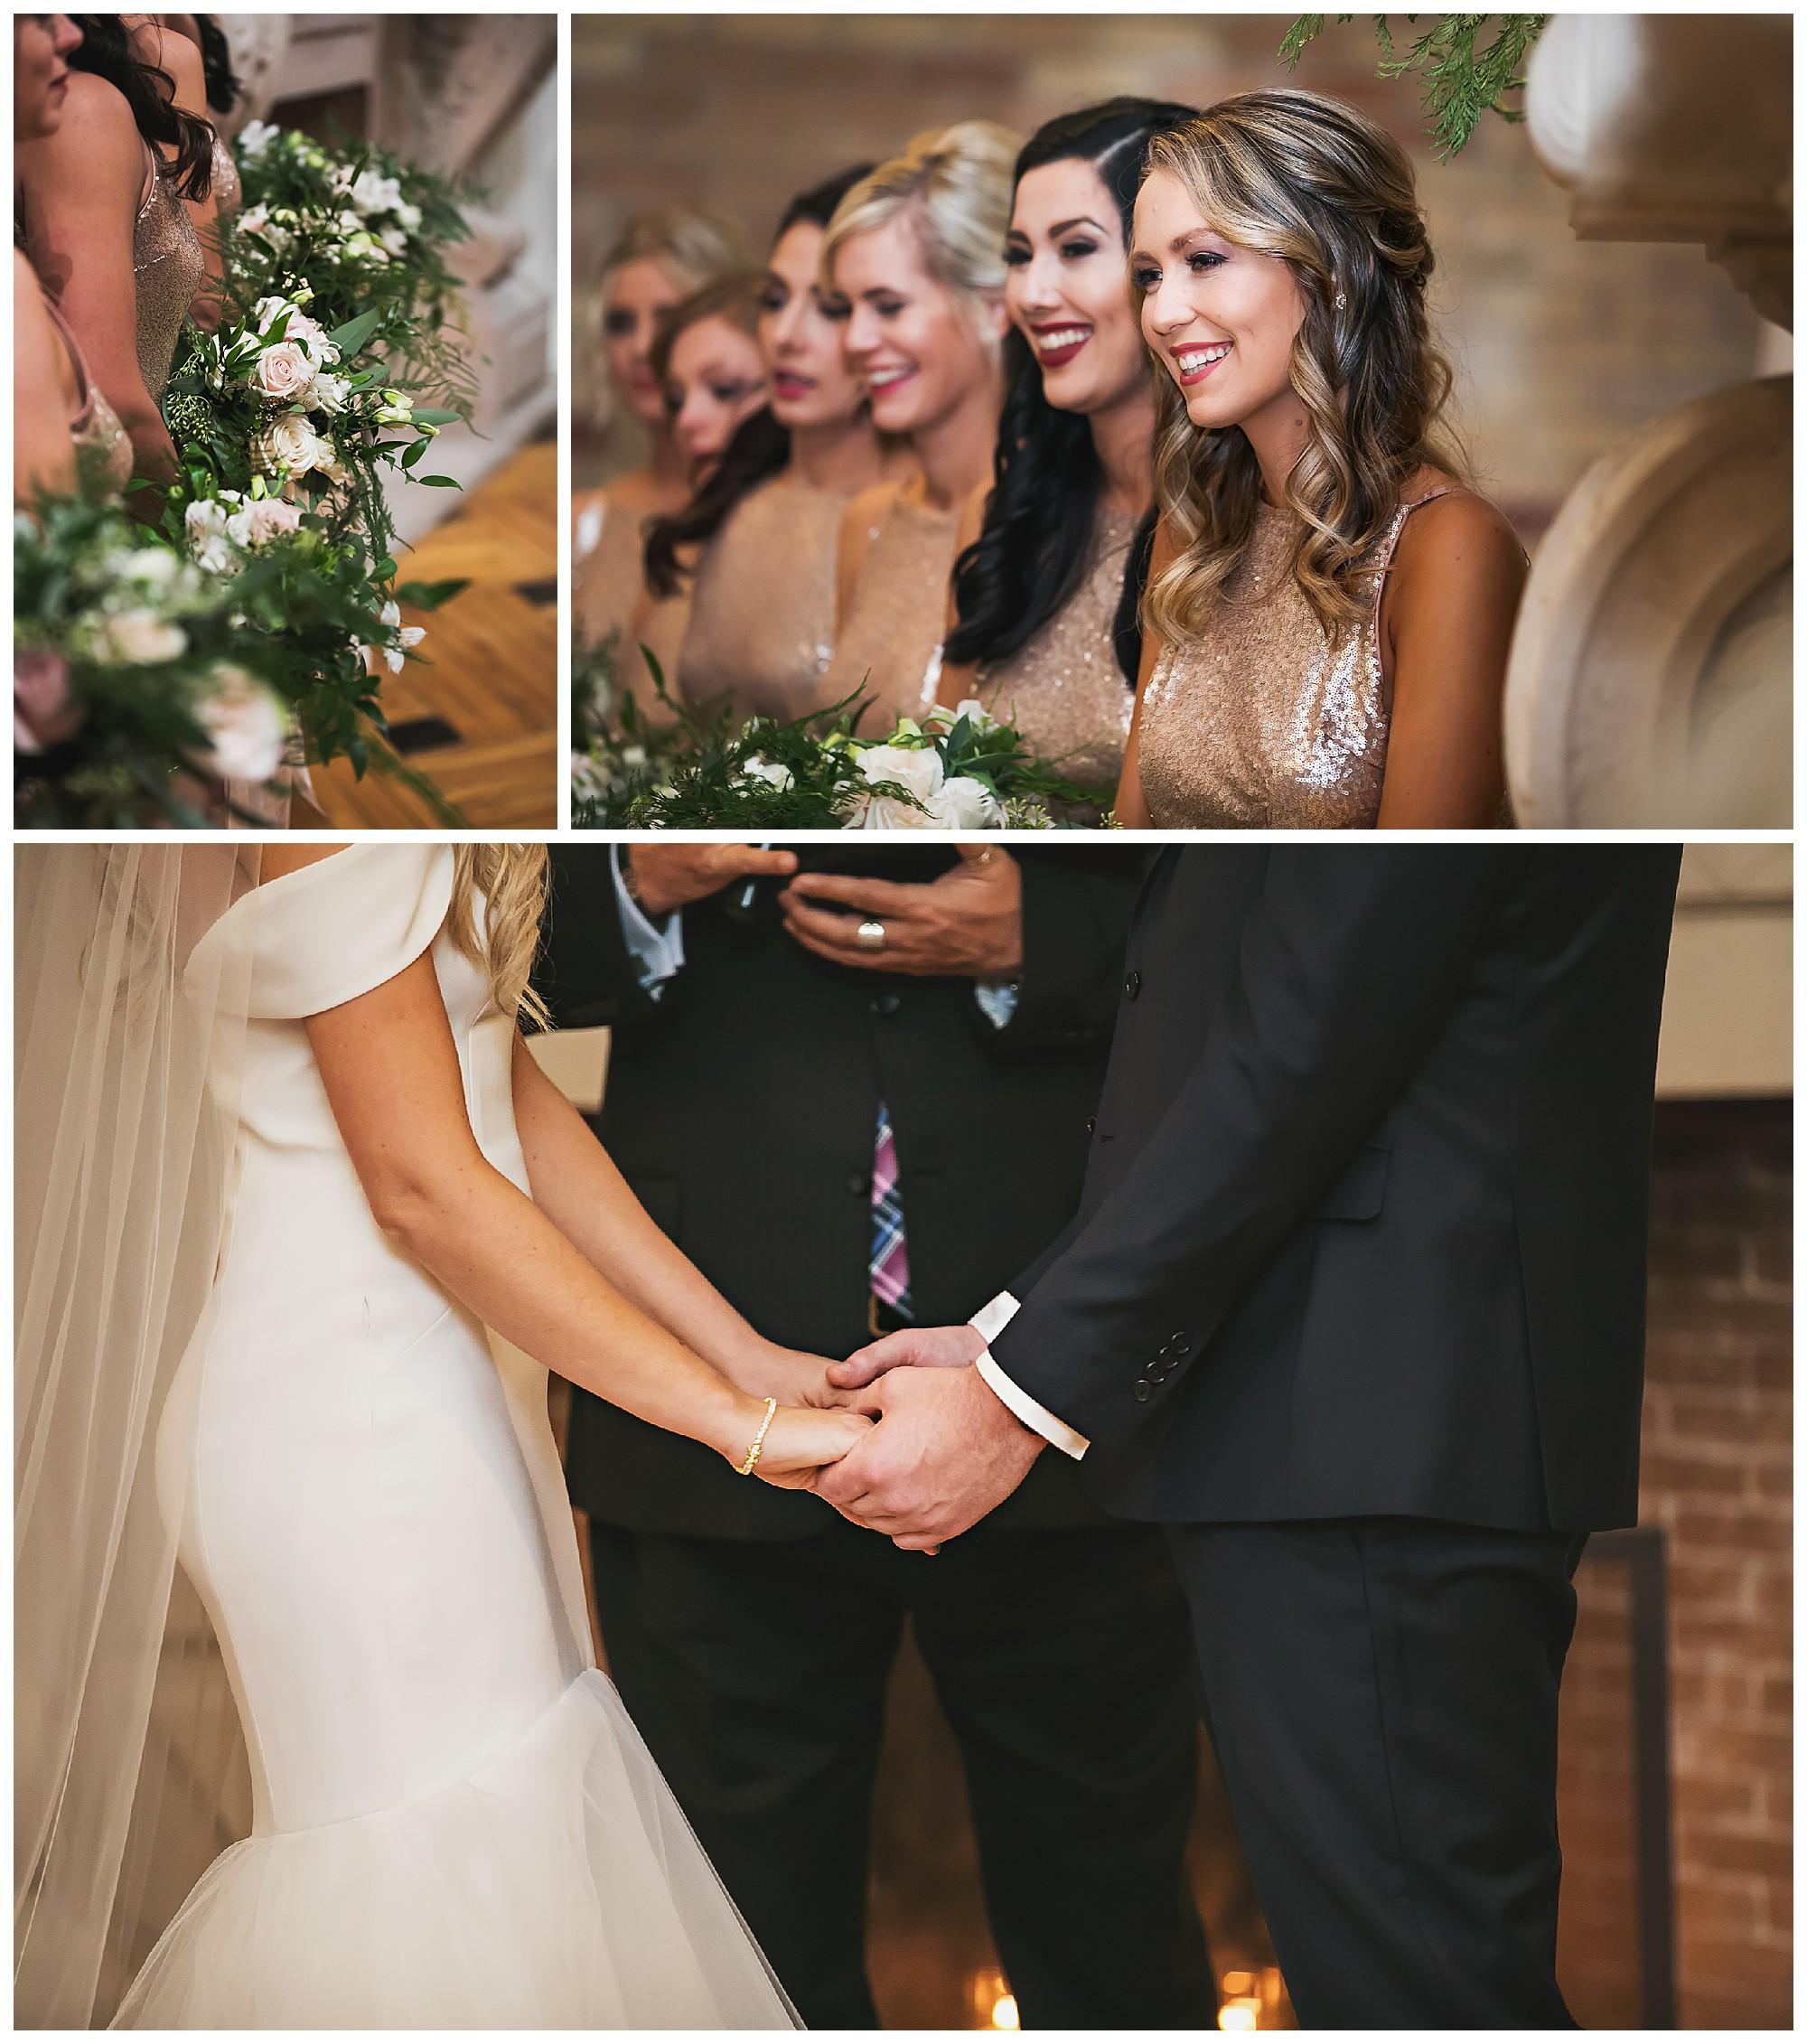 Hacienda-Sarria-Wedding-Photos-NYE-Michelle-Matt-VanDaele-Russell_0032.jpg